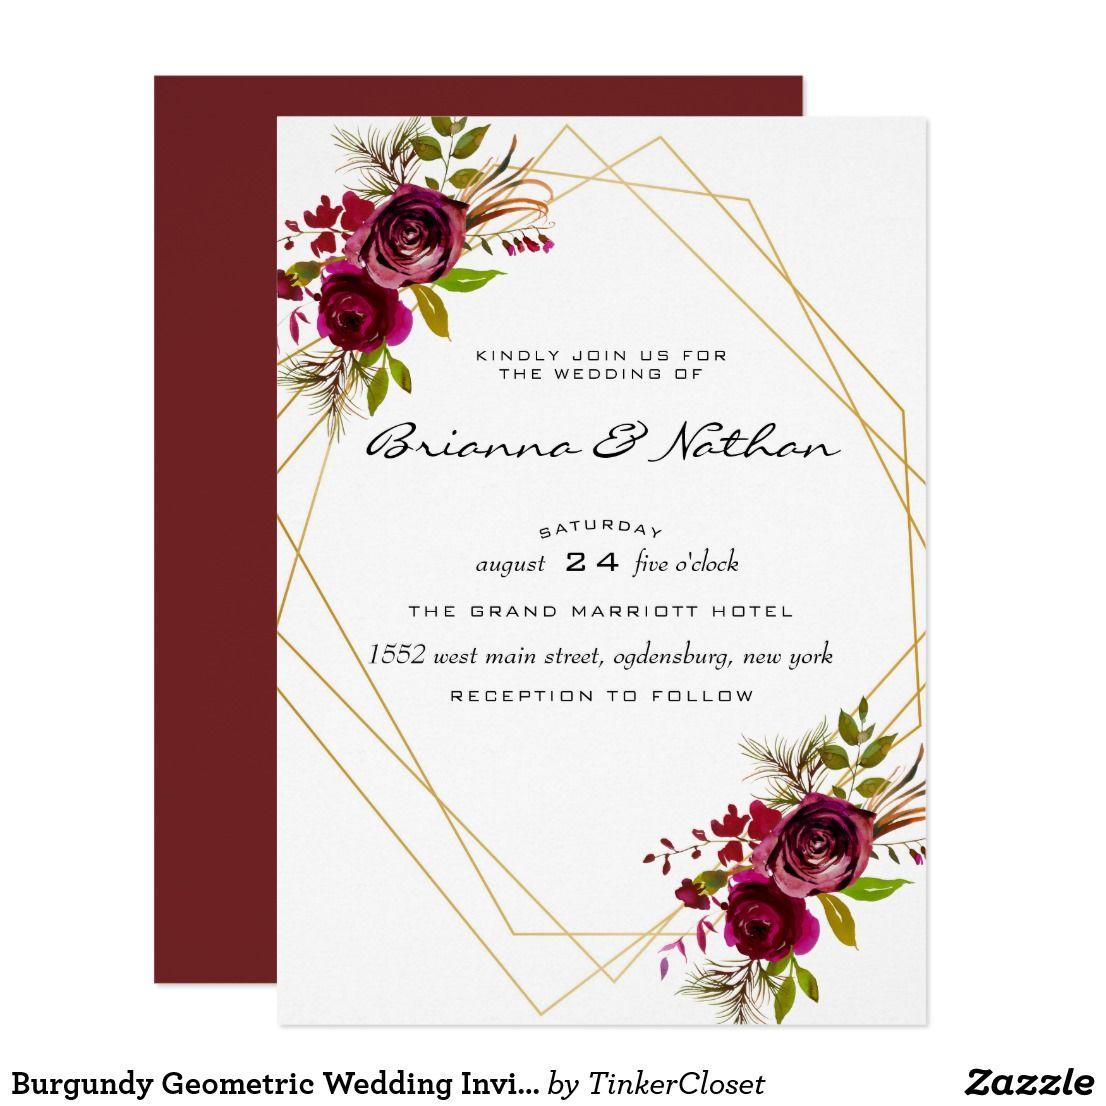 Burgundy Geometric Wedding Invitation Zazzle.ca